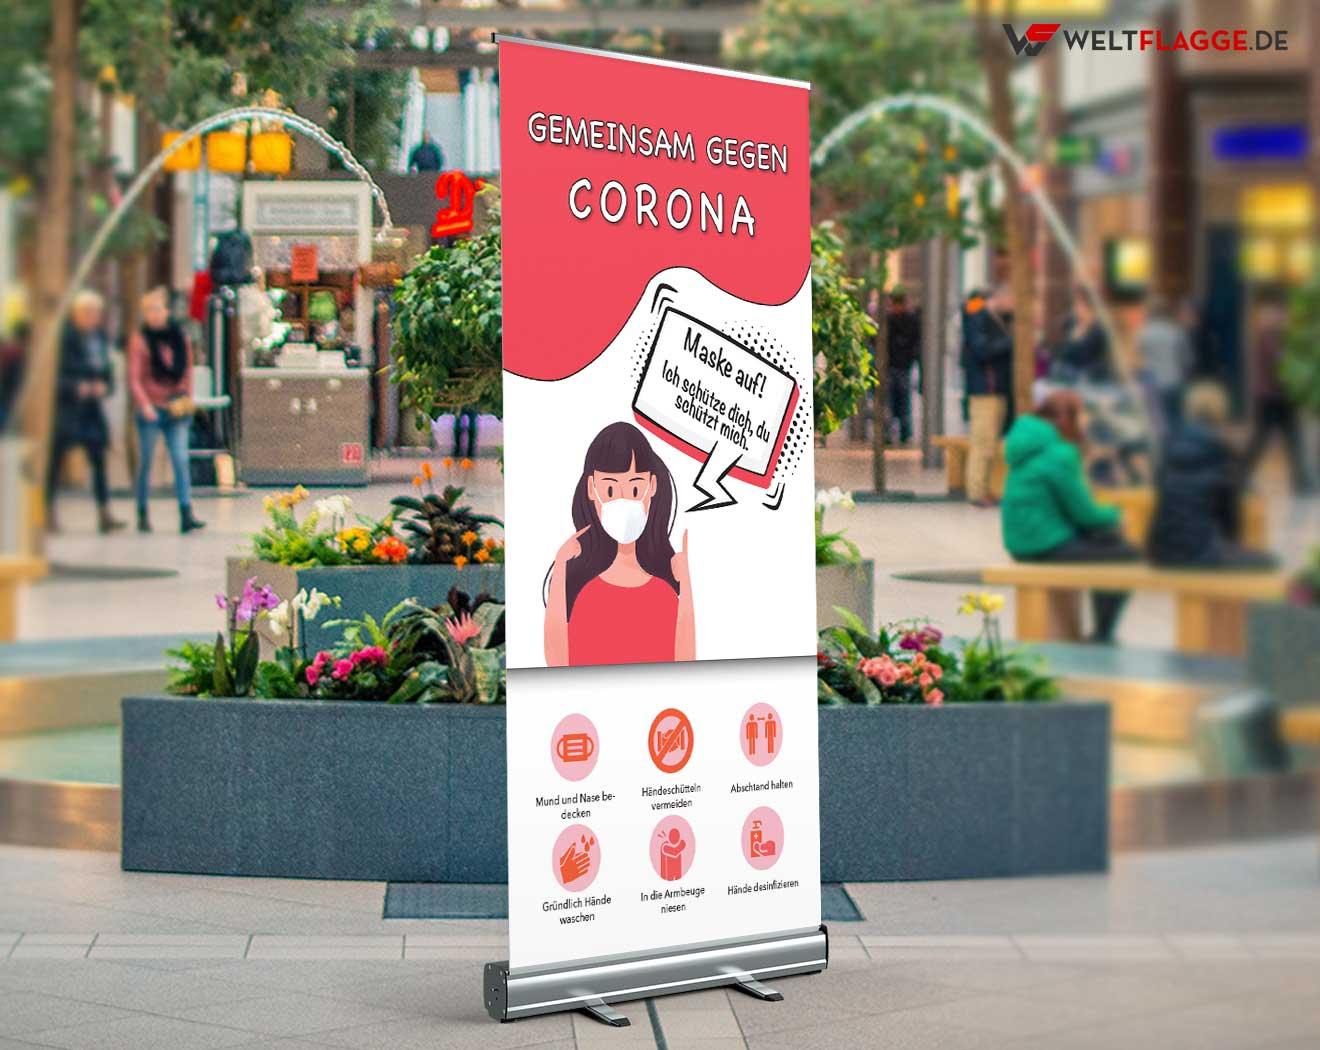 Gemeinsam gegen Corona Roll-Up Banner bedrucken lassen